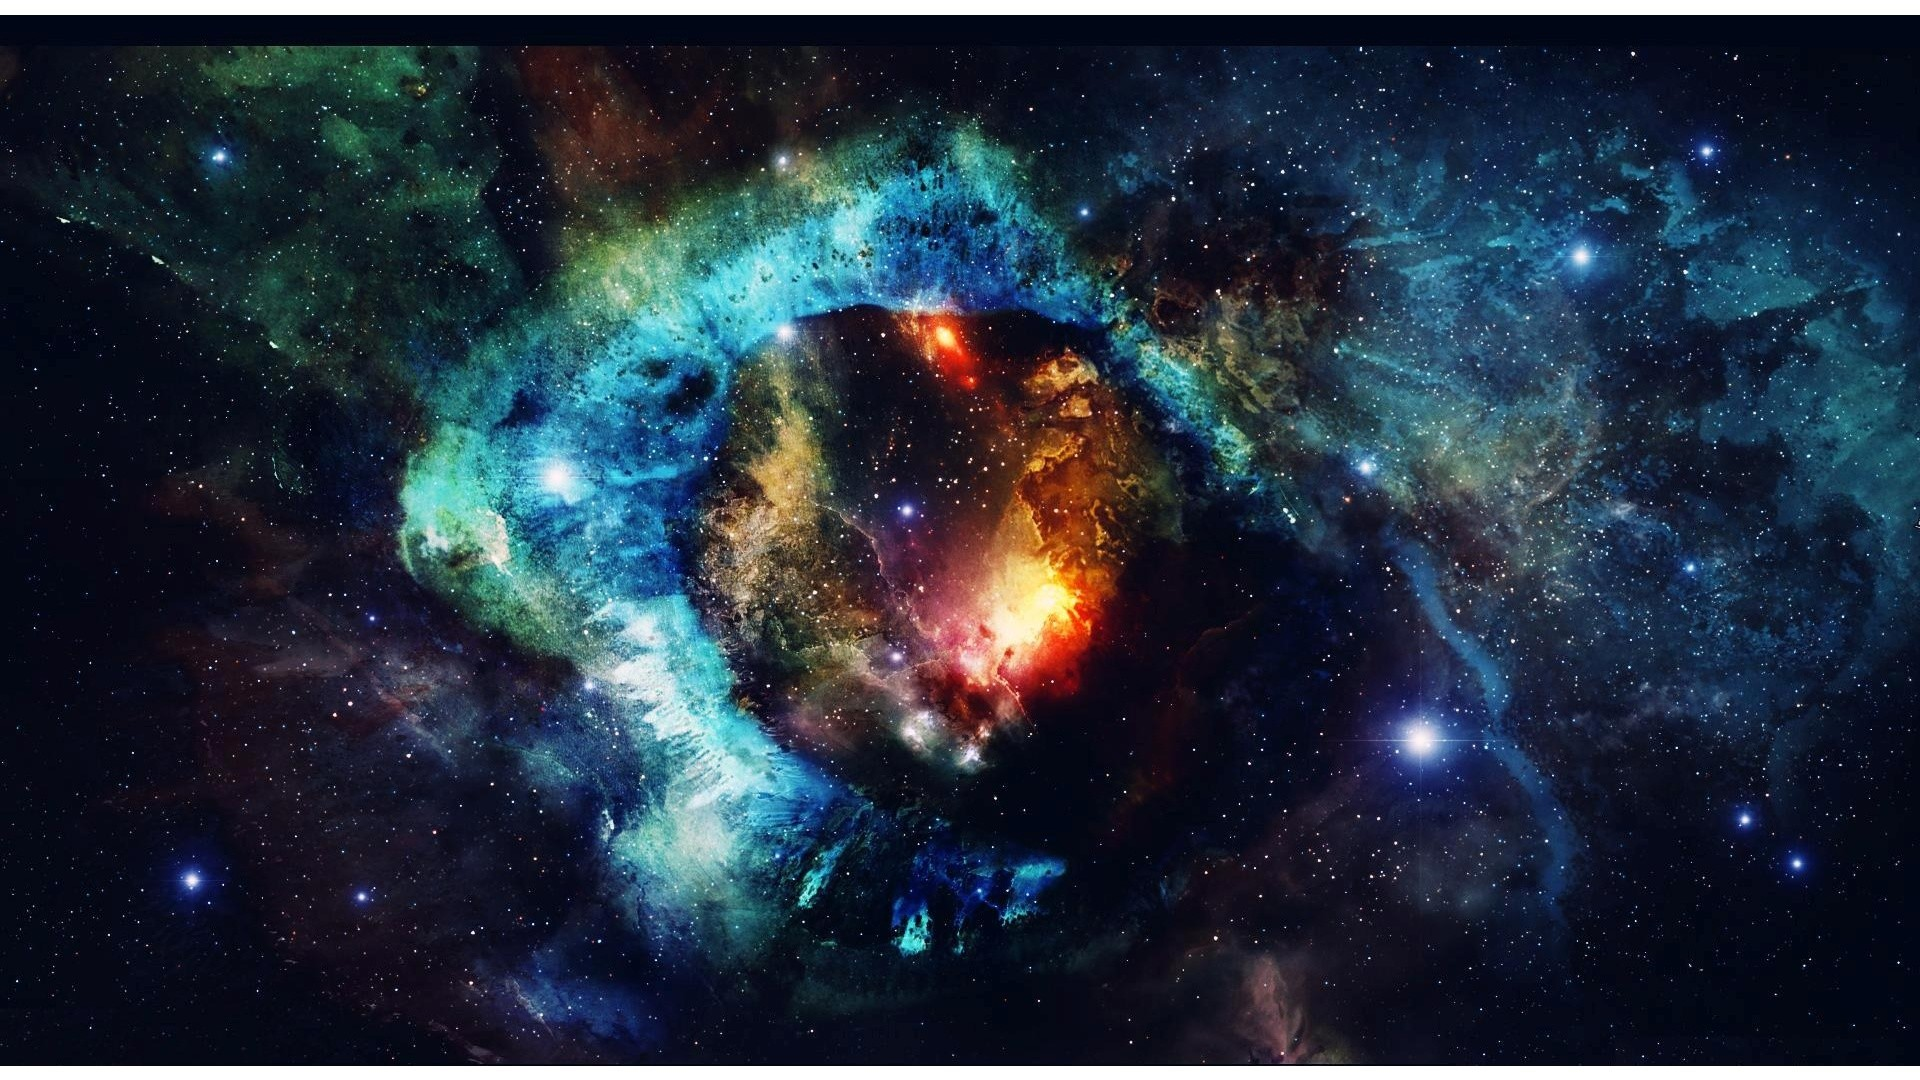 Nebula And Stars In Universe